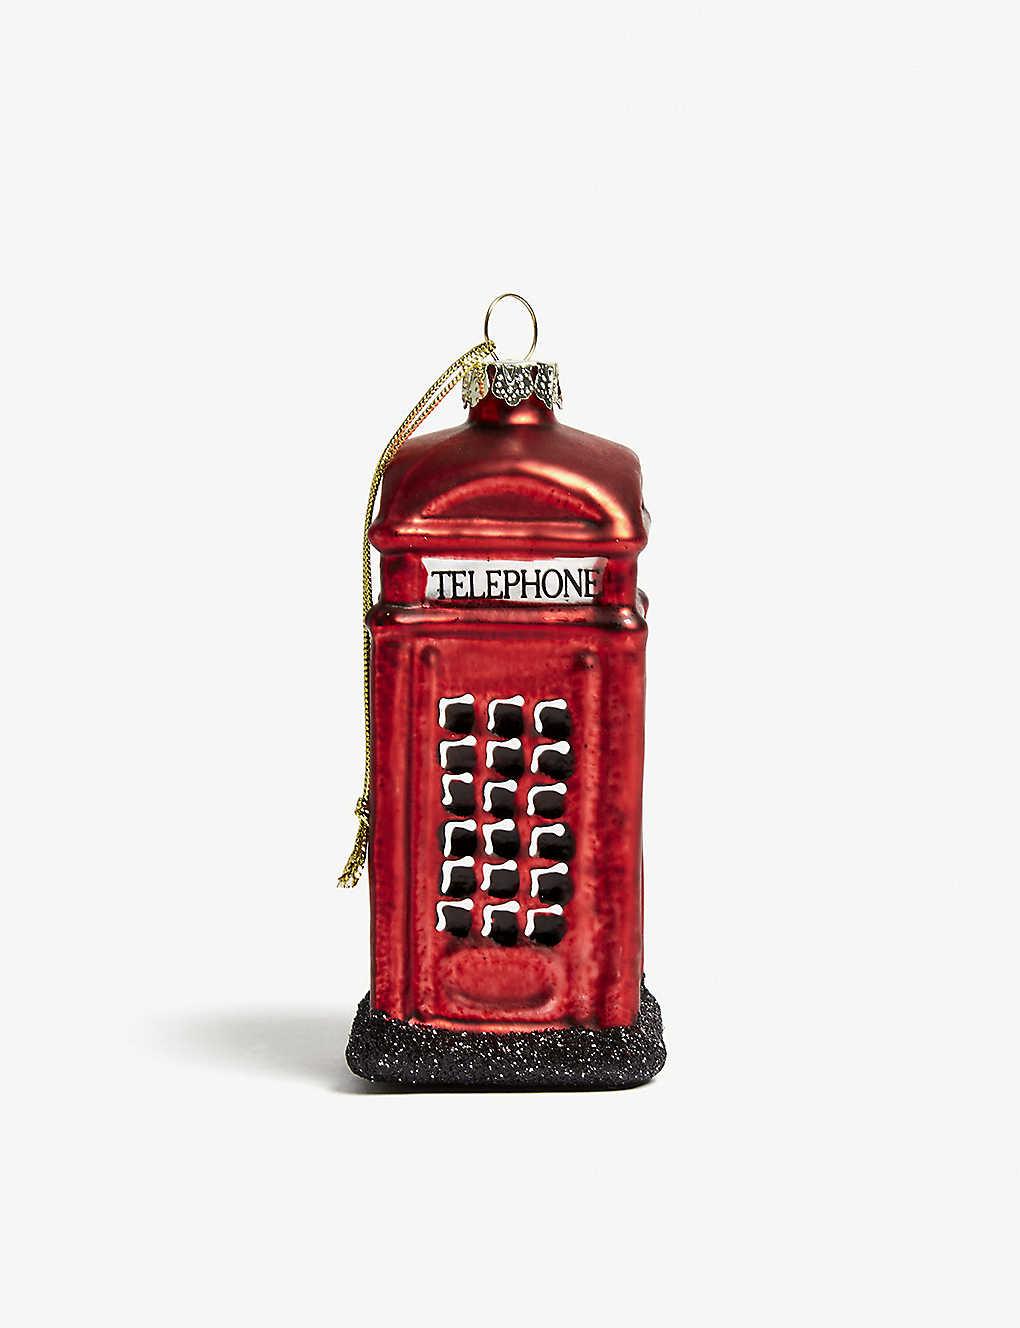 GISELA GRAHAM - London phone box glass hanging ornament 10cm